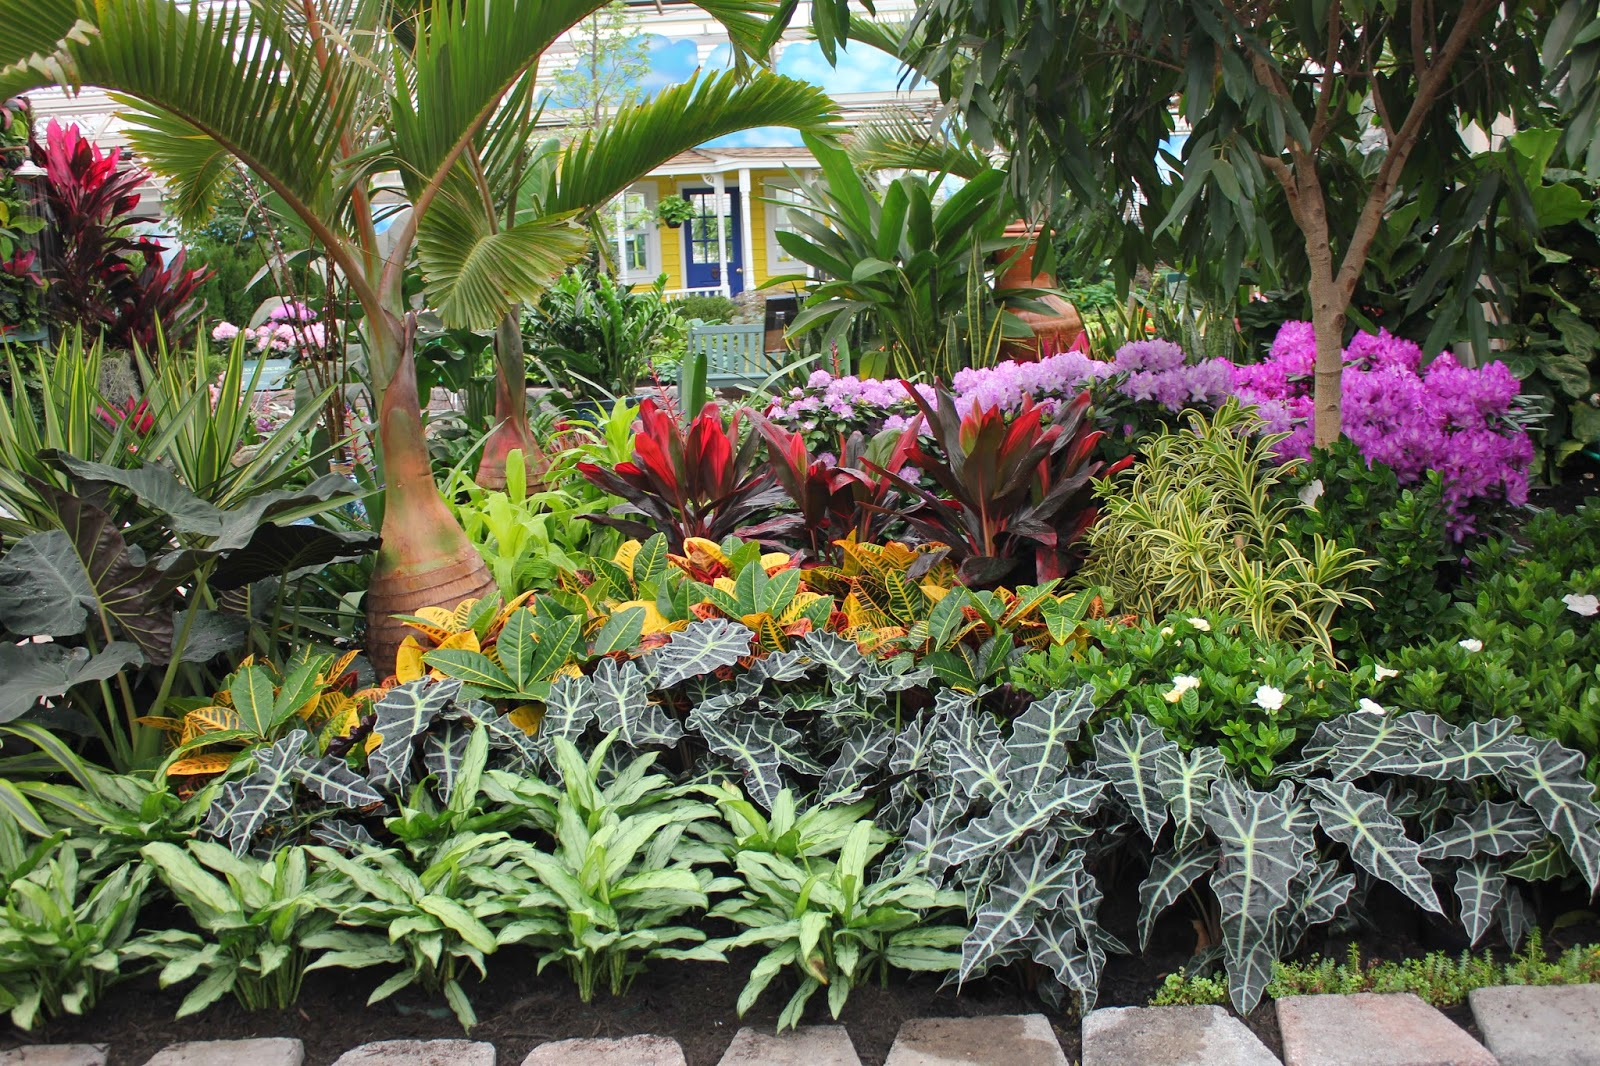 Gardening and Gardens March 2014